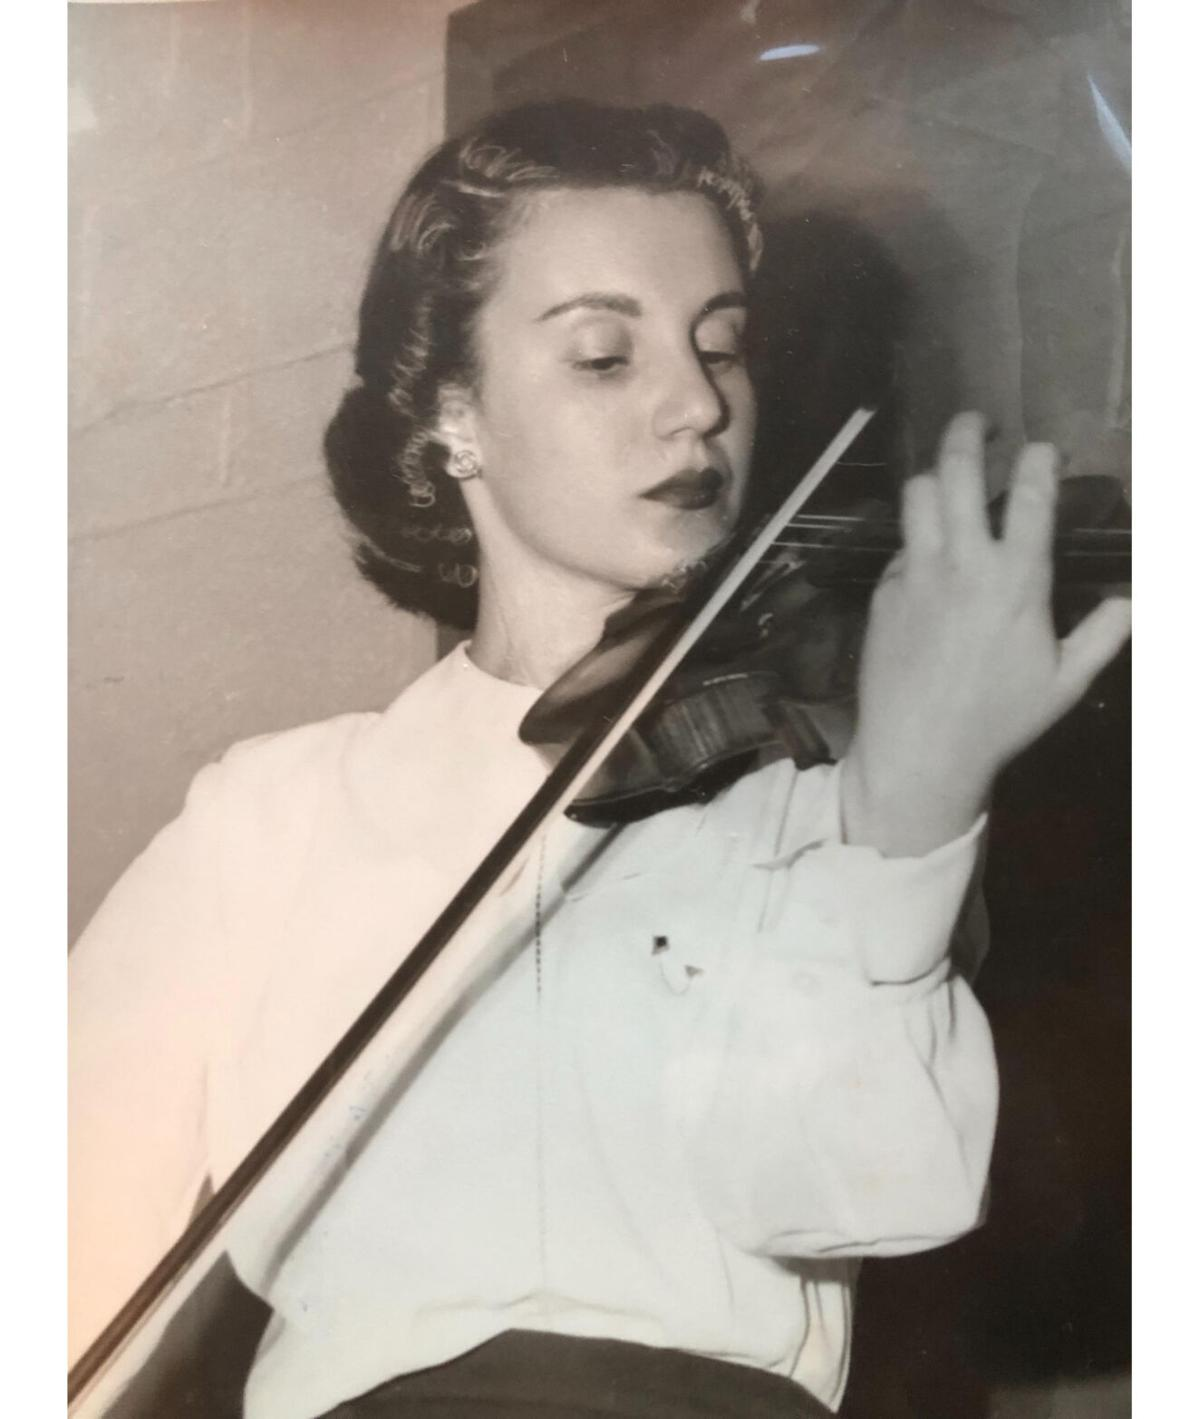 Marie K. Fornarotto